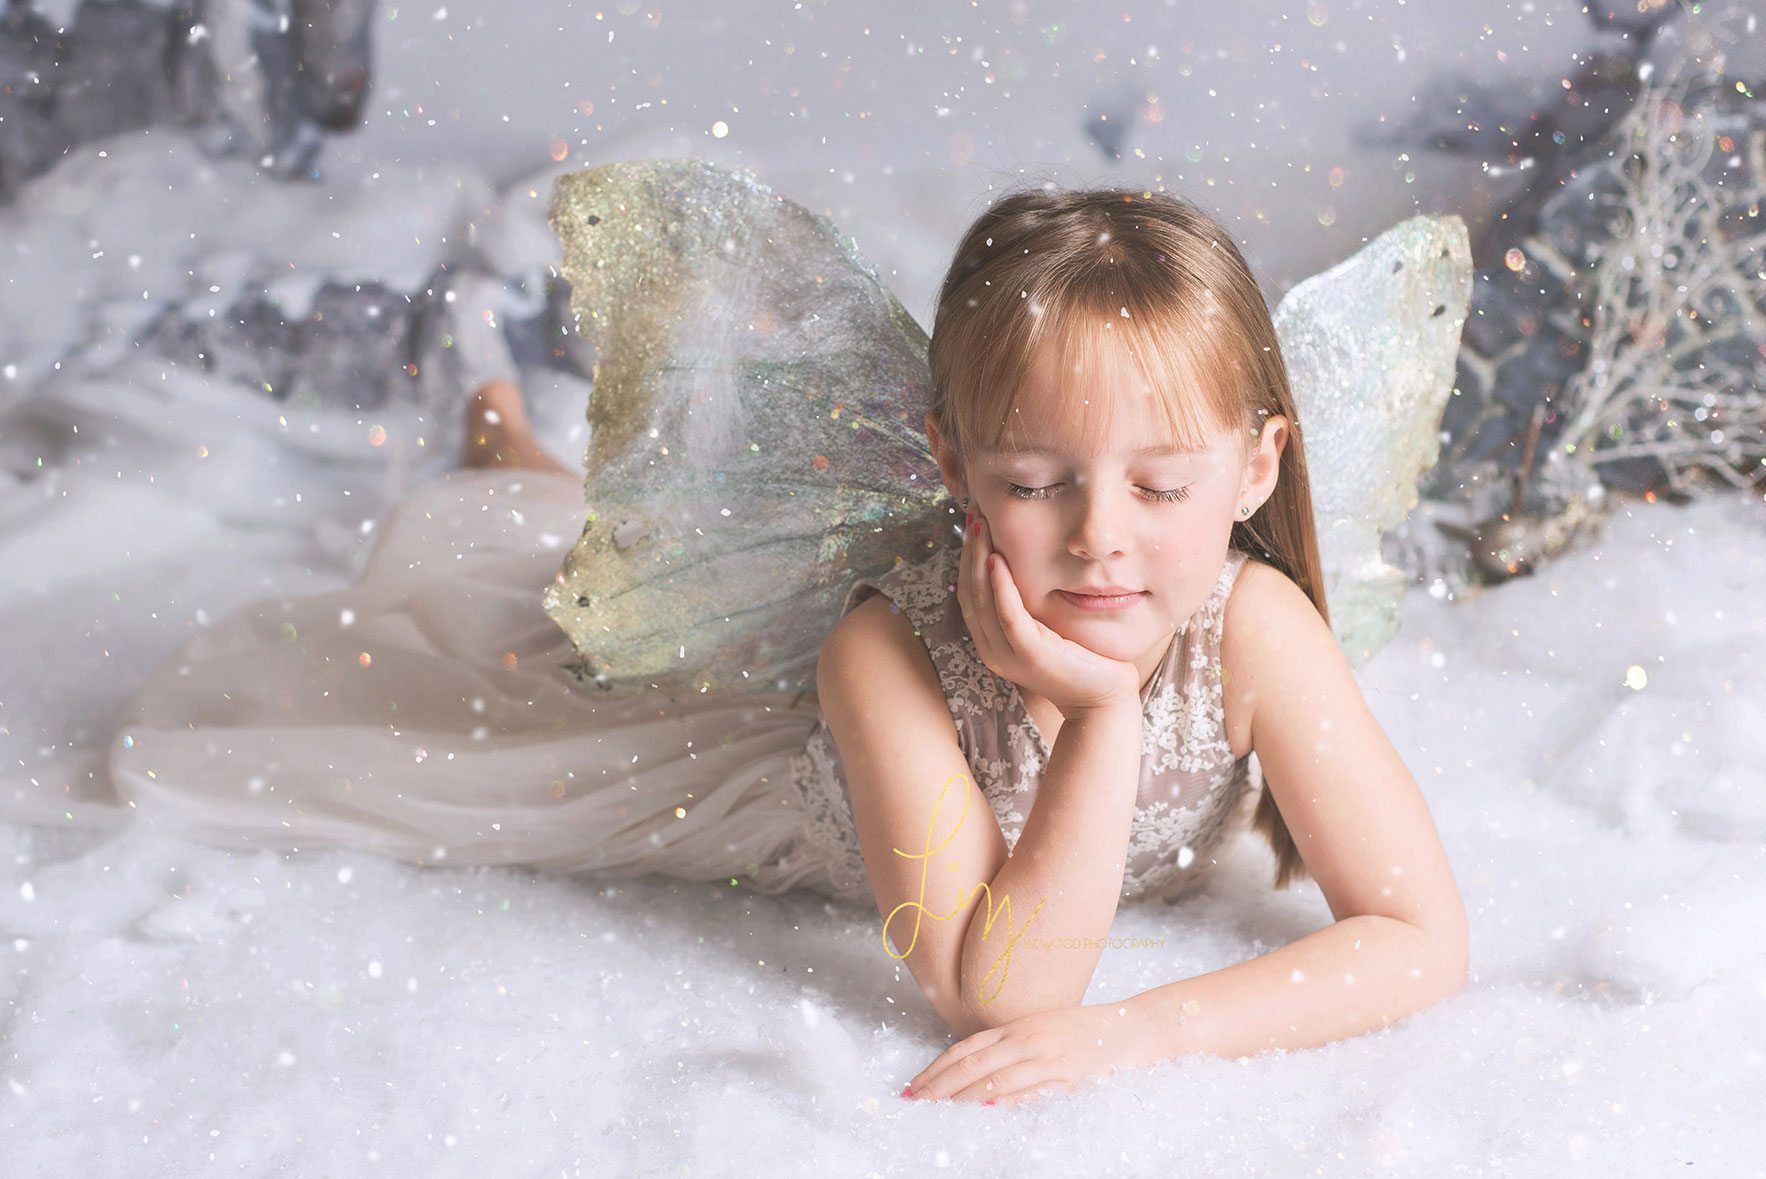 Snow fairy photoshoot - child photographer in Essex